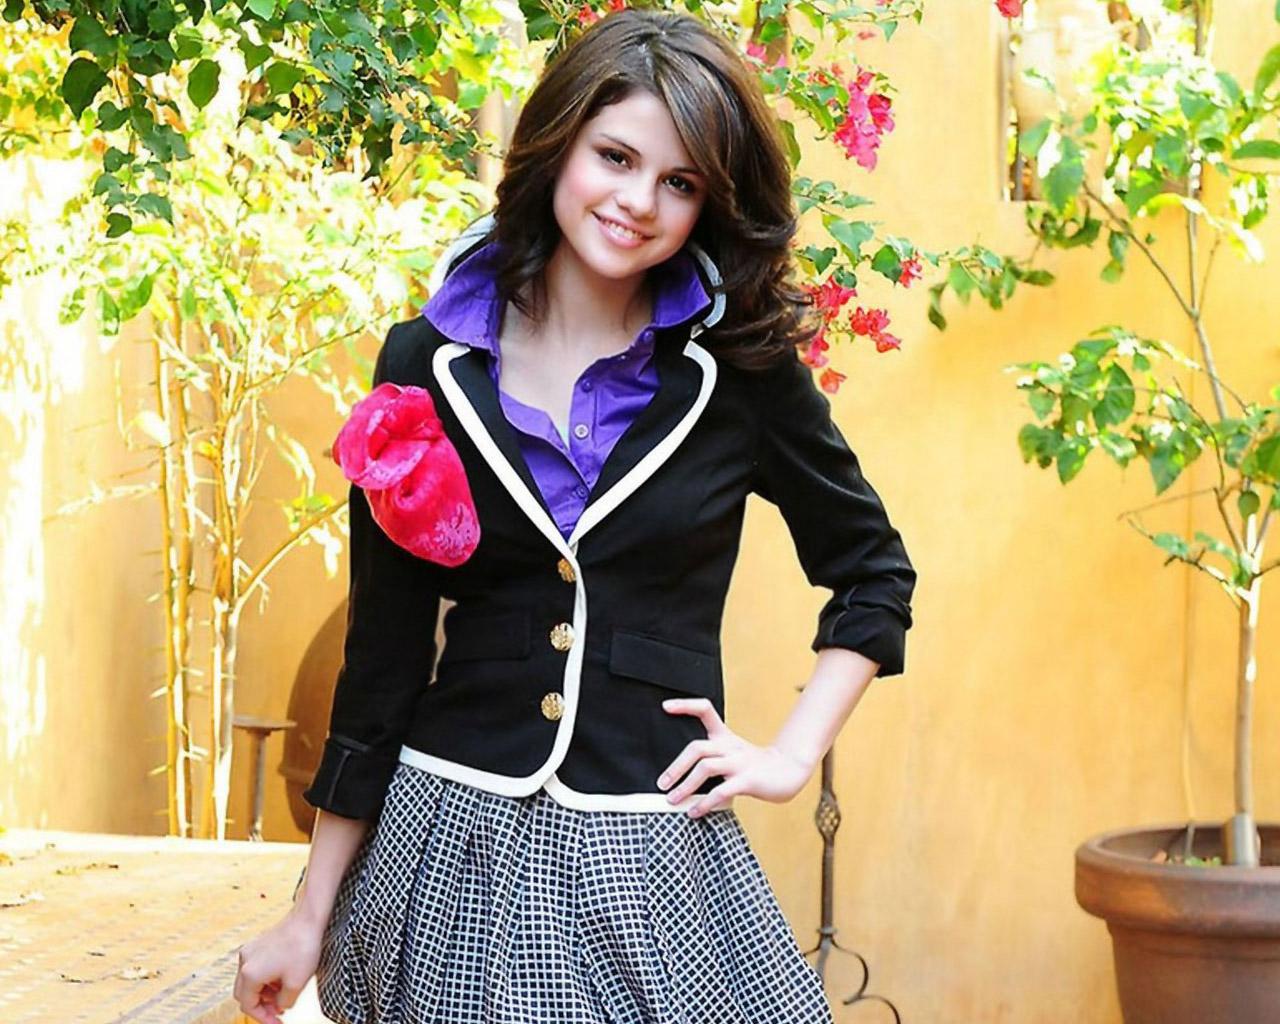 HD Wallpapers Selena Gomez 12